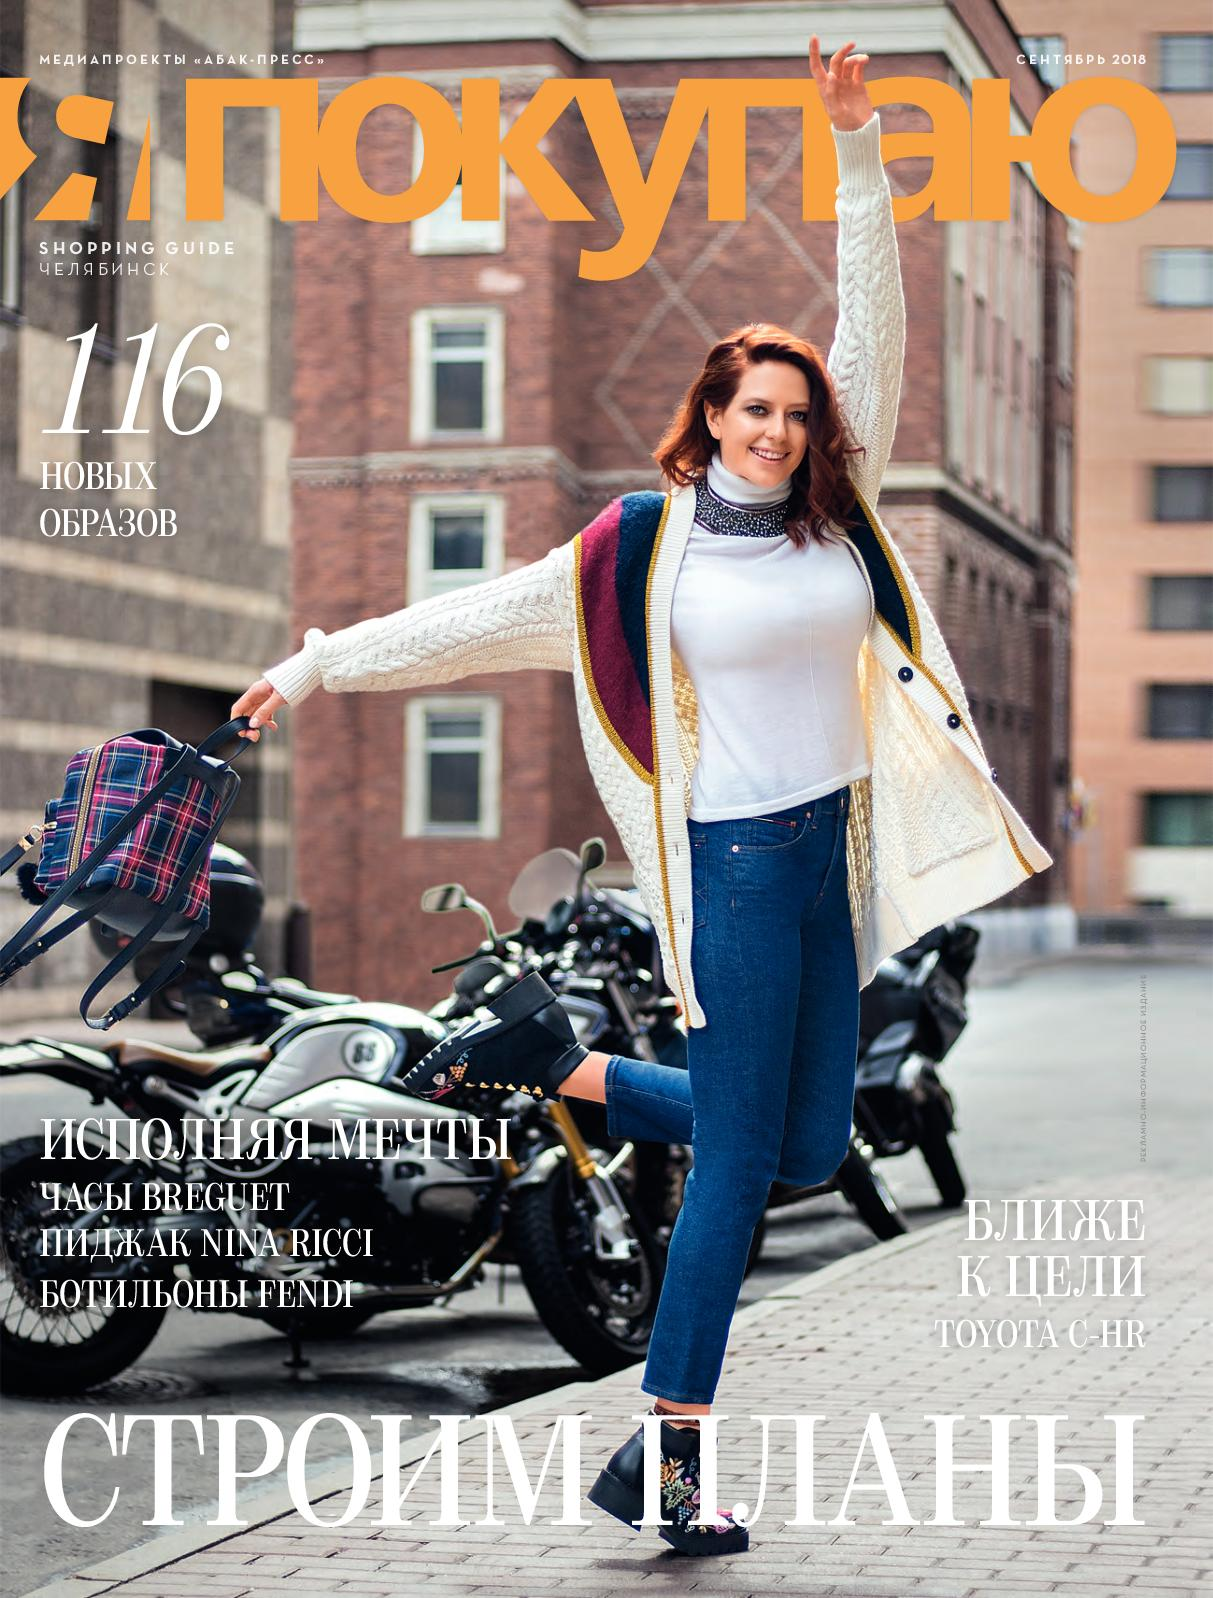 adc501b430d6 Calaméo - Shopping Guide «Я Покупаю. Челябинск», сентябрь 2018